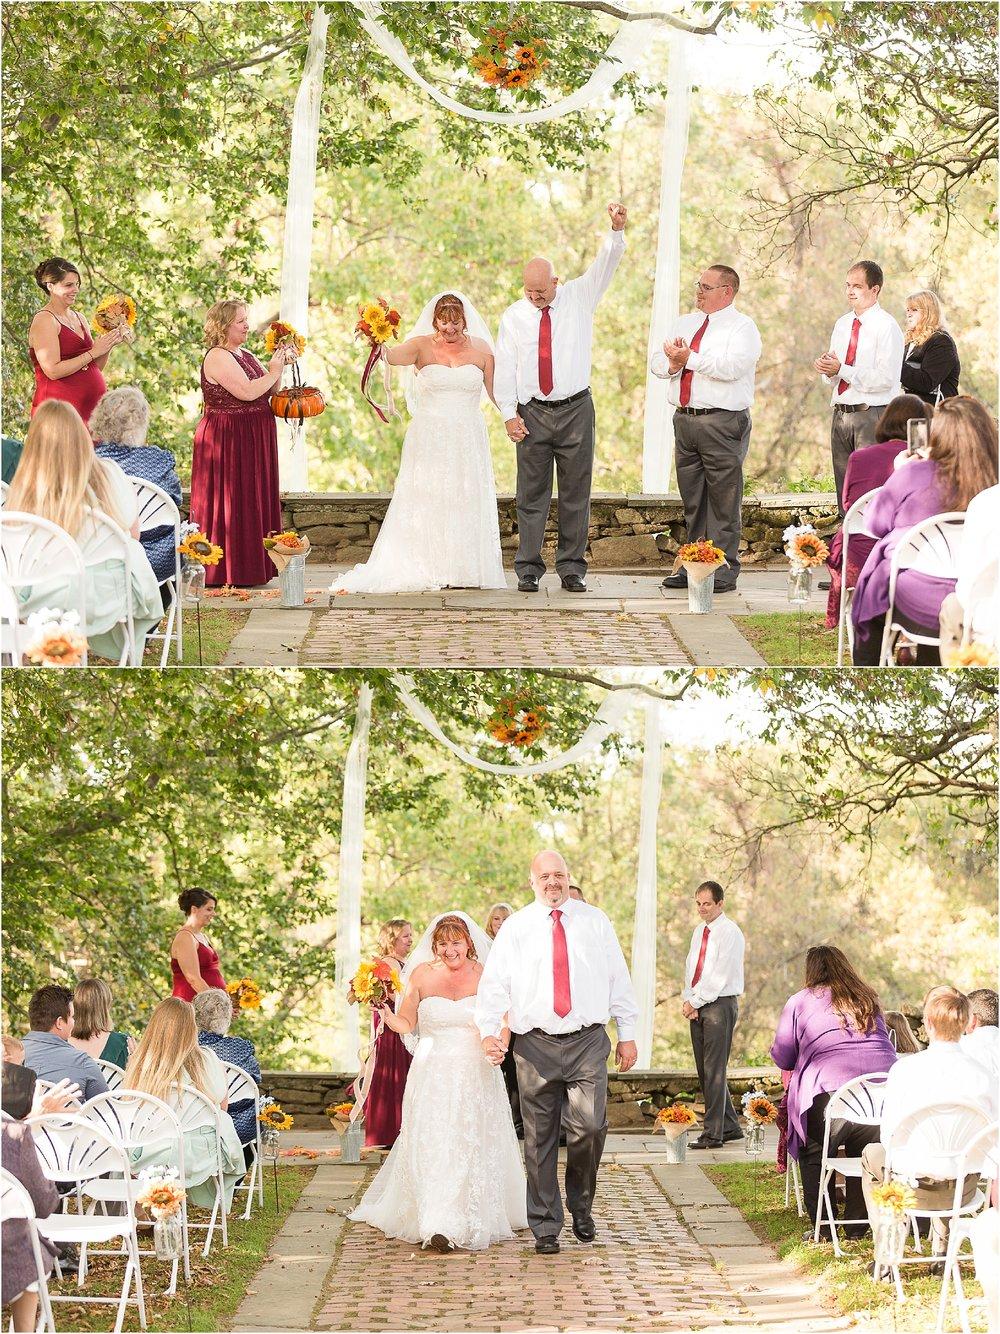 havre-de-grace-wedding-photographer-150.jpg